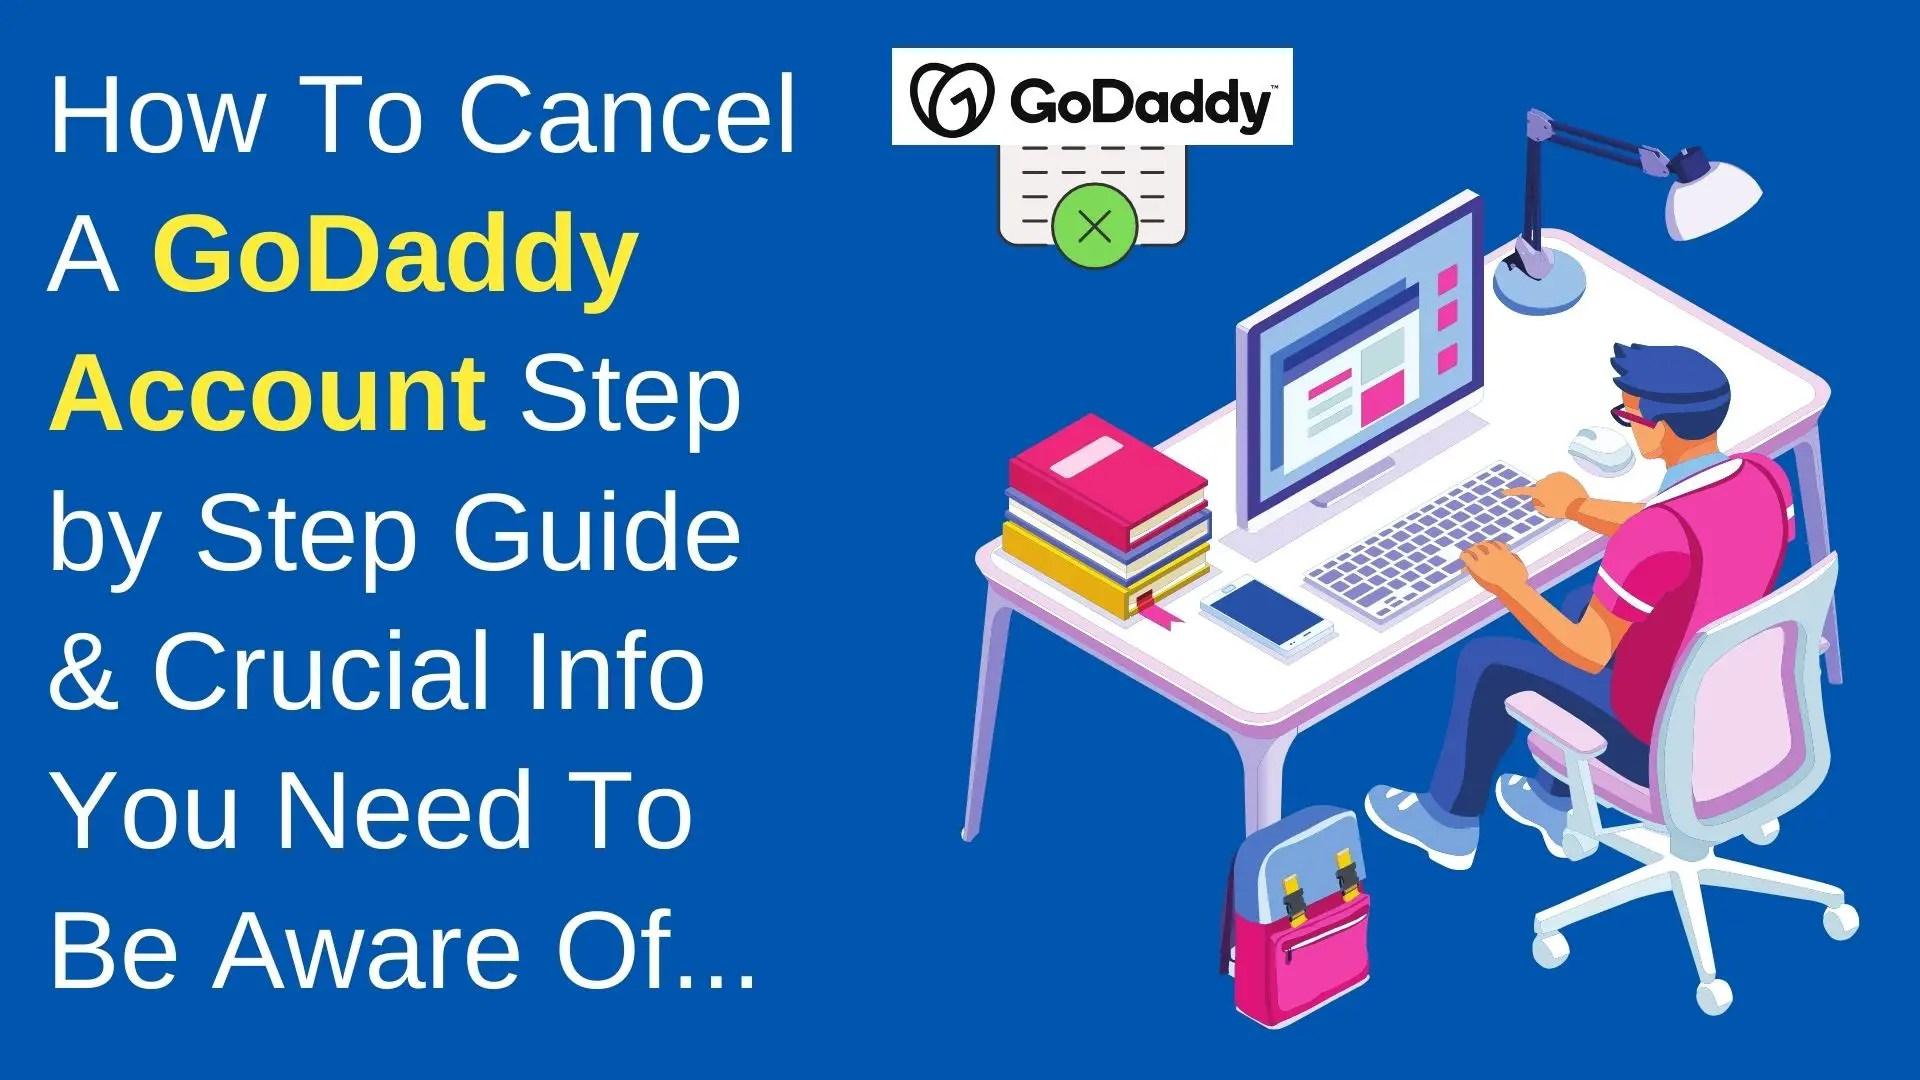 How To Cancel A GoDaddy Account